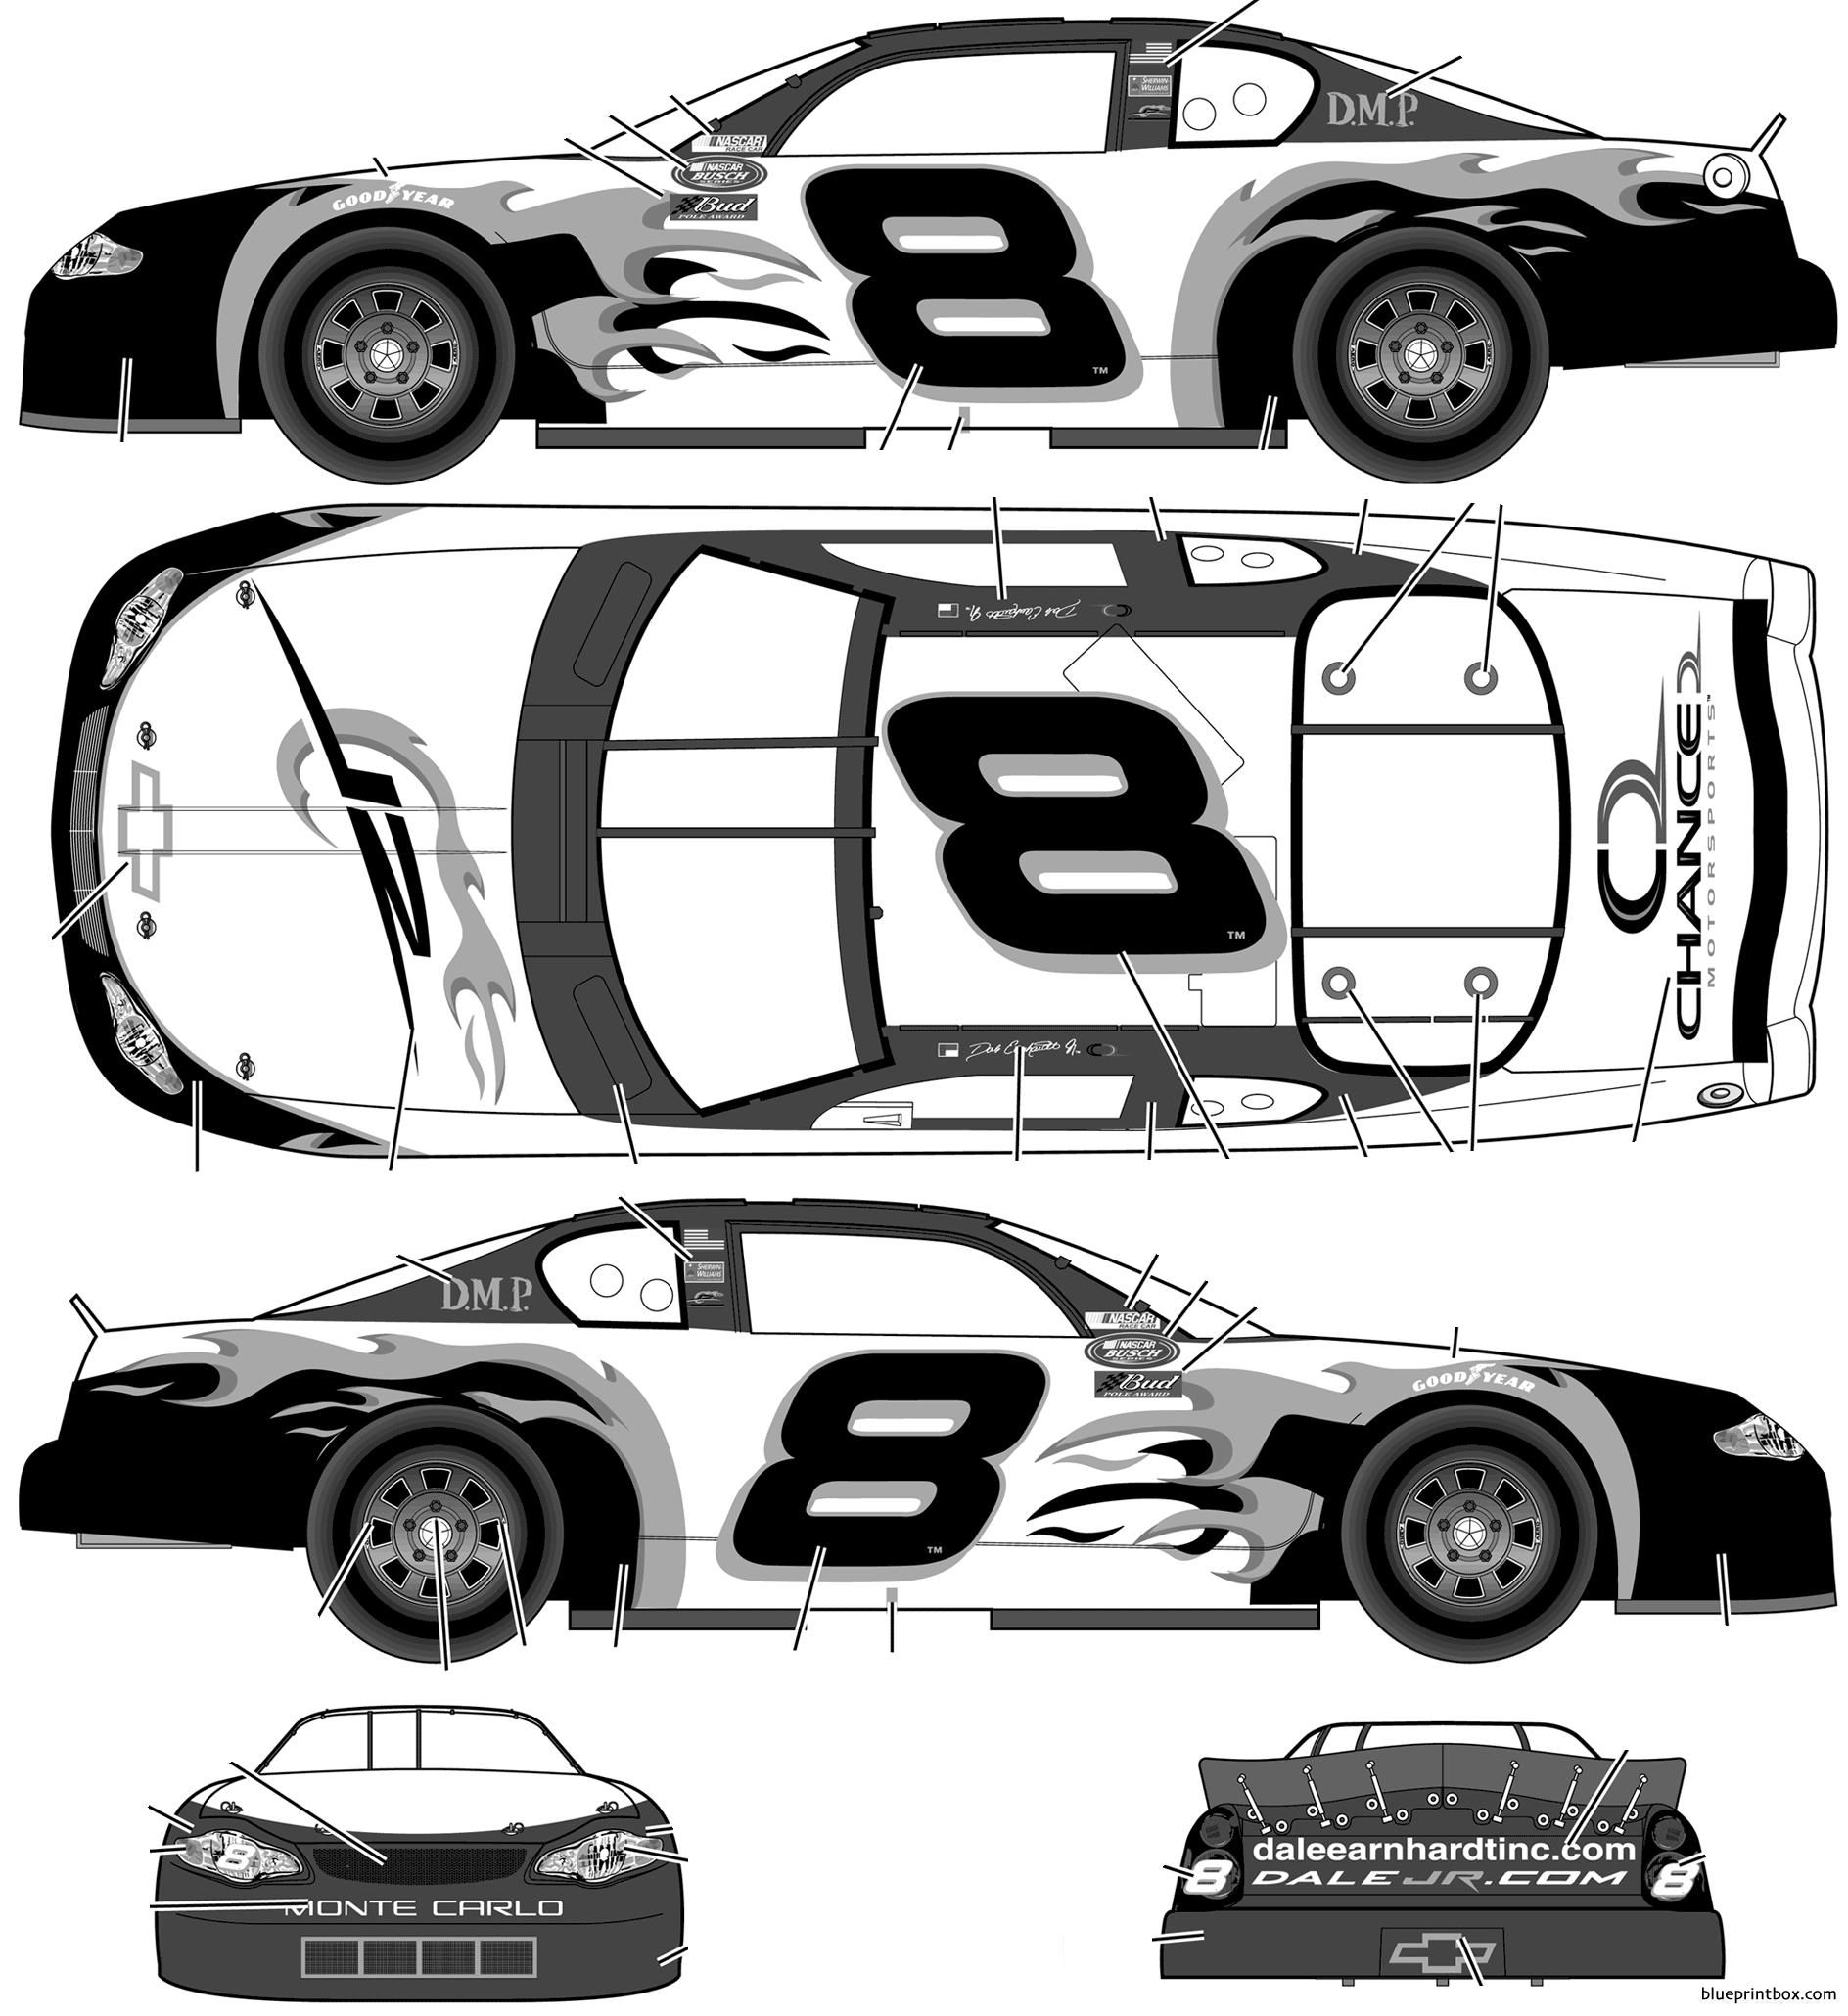 Chevrolet Monte Carlo No8 Dale Earnhardt Jr Chance 2